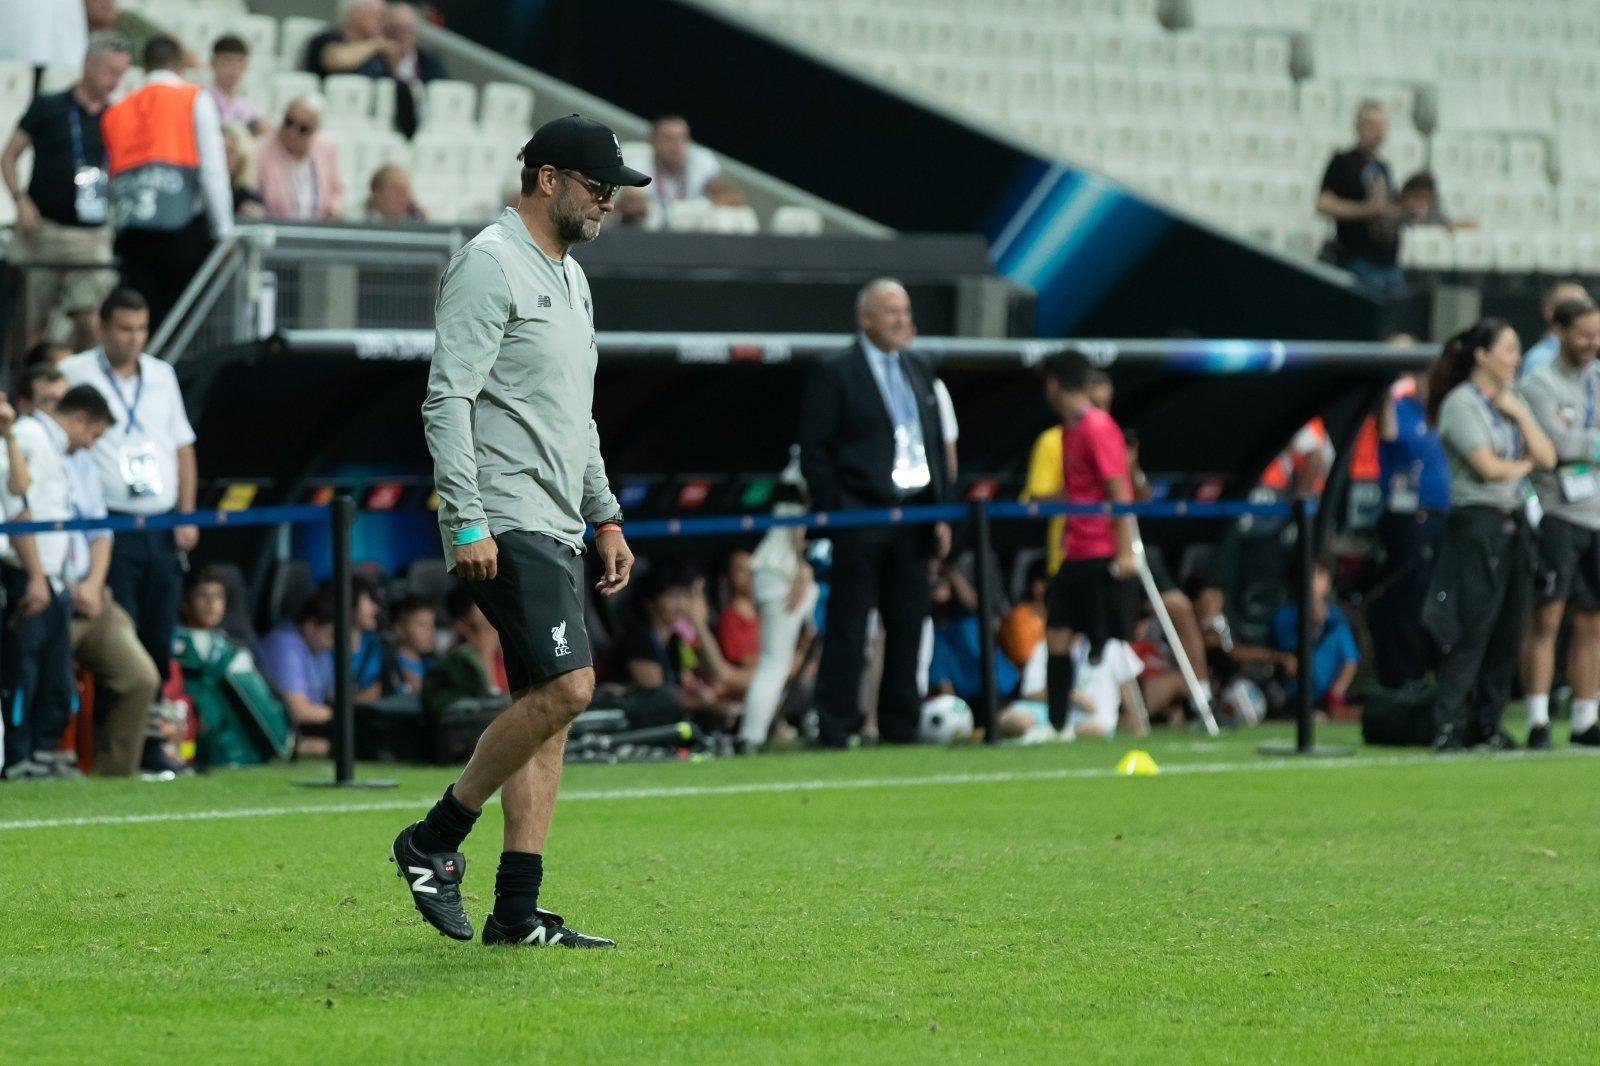 Liverpool-Plan: Steven Gerrard soll Jürgen Klopp beerben - Fussball Europa